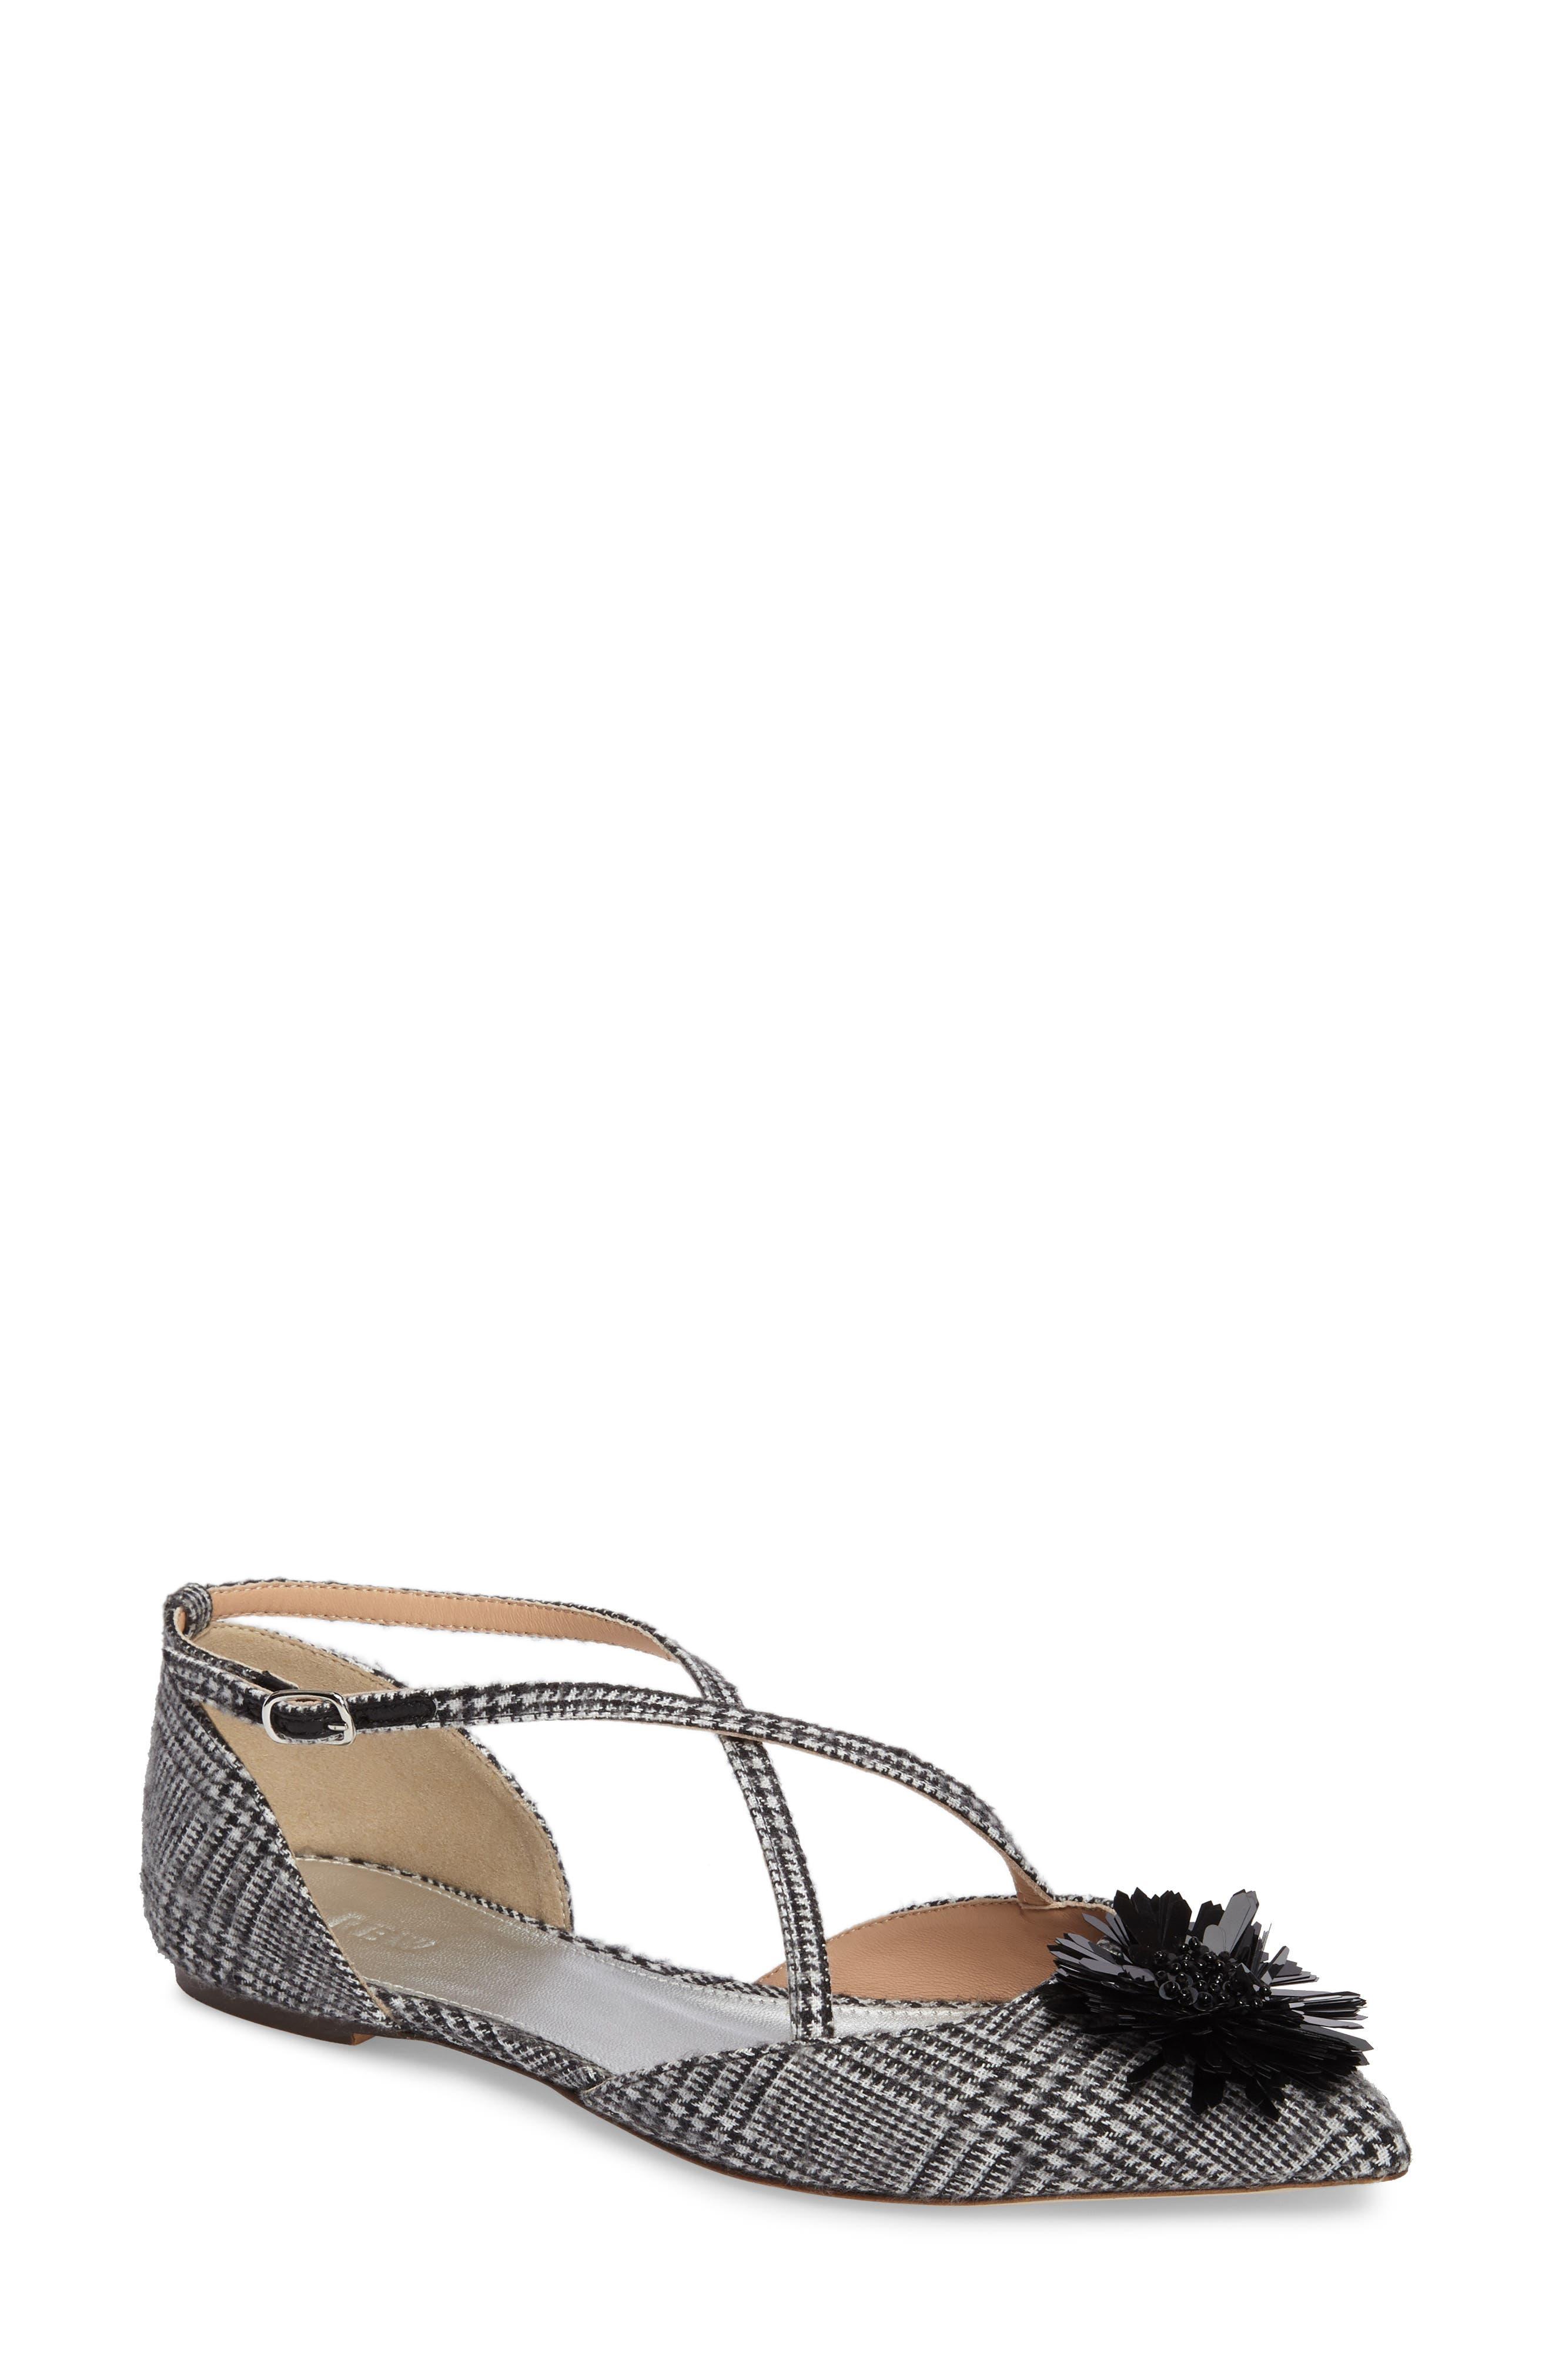 Sadie Cross Strap Pointy Toe Flat,                             Main thumbnail 1, color,                             Black/ White Fabric